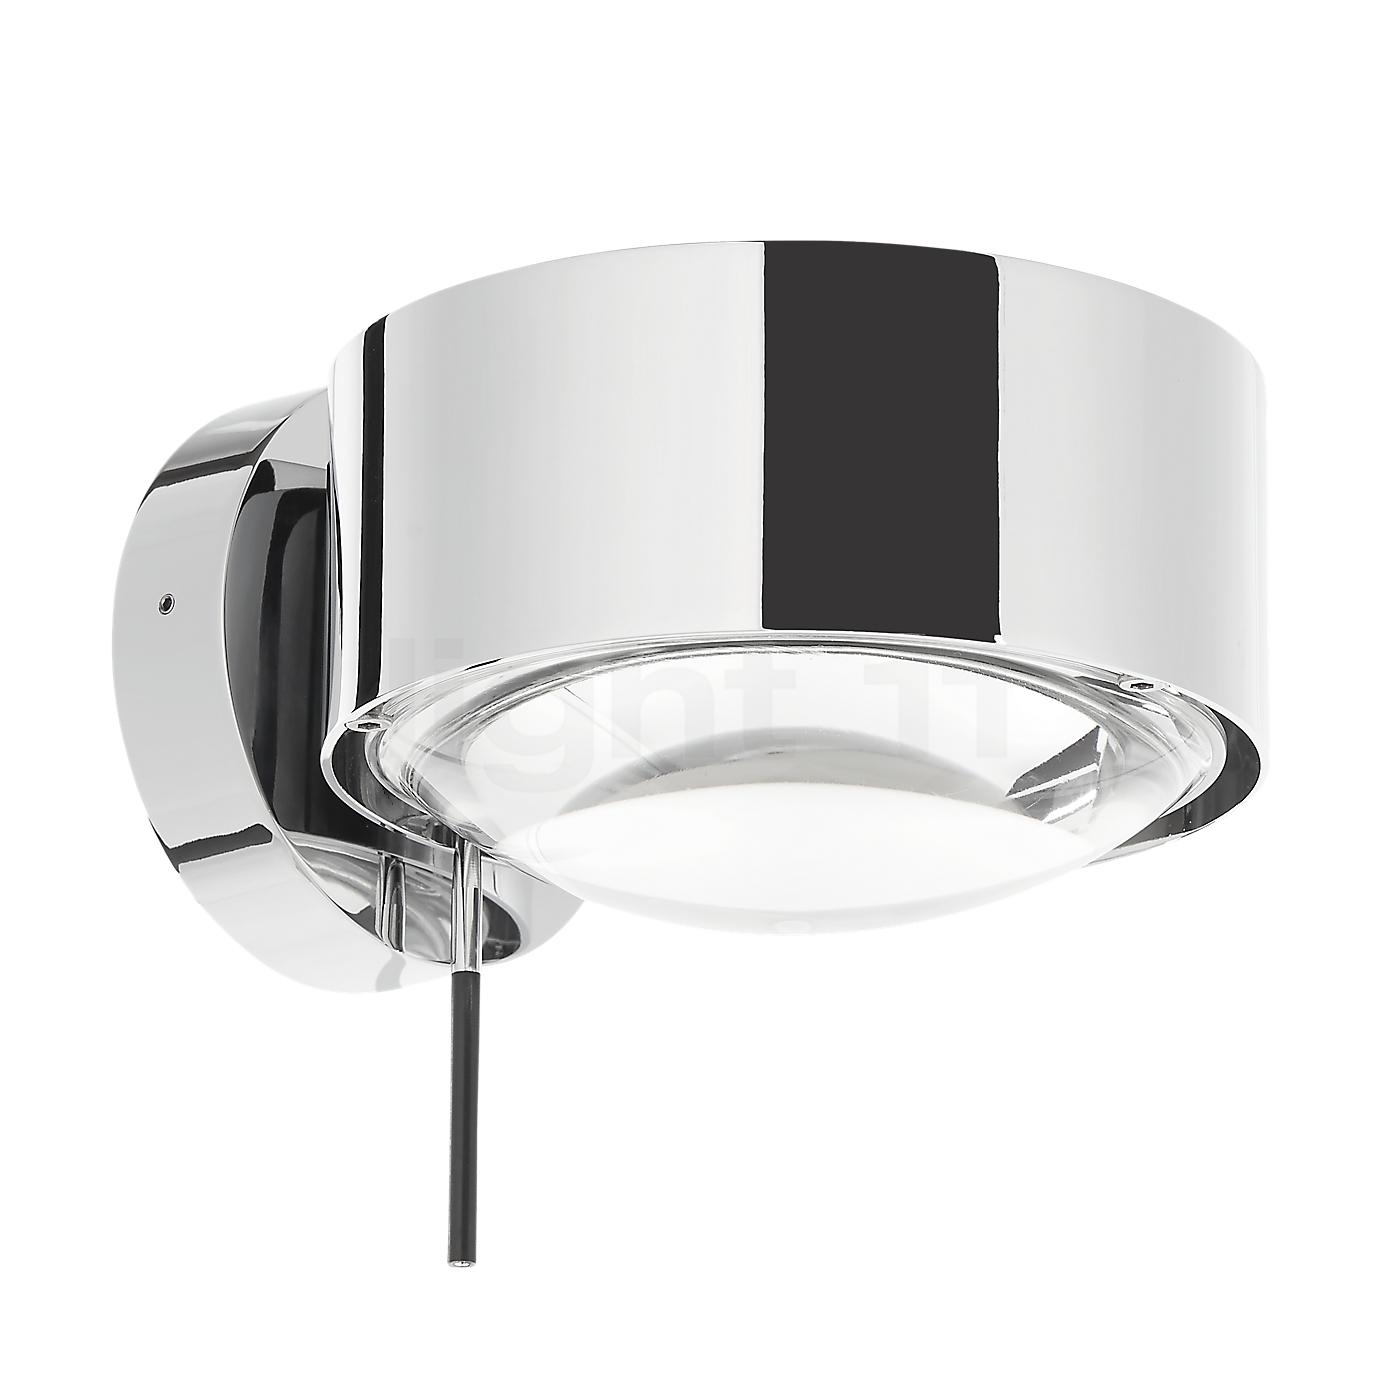 top light puk meg maxx wall led kopen op. Black Bedroom Furniture Sets. Home Design Ideas